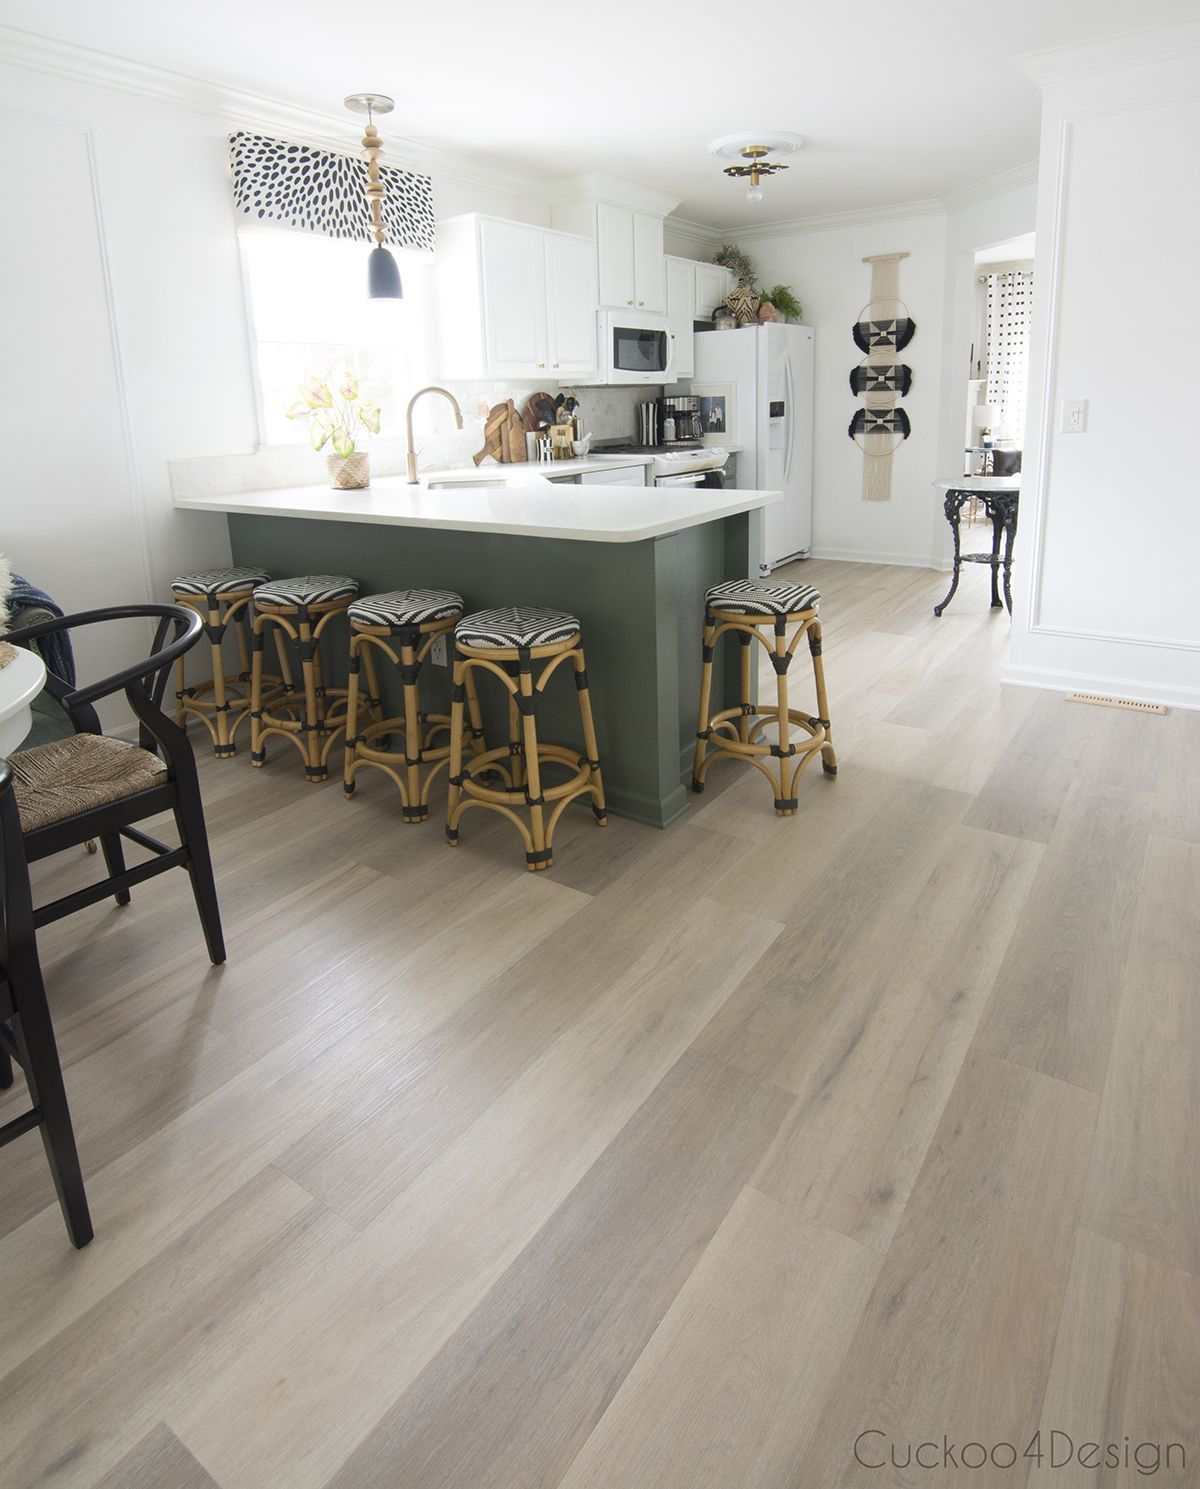 Most Popular Kitchen Flooring: Why I Chose Karndean Vinyl Wood Plank Flooring